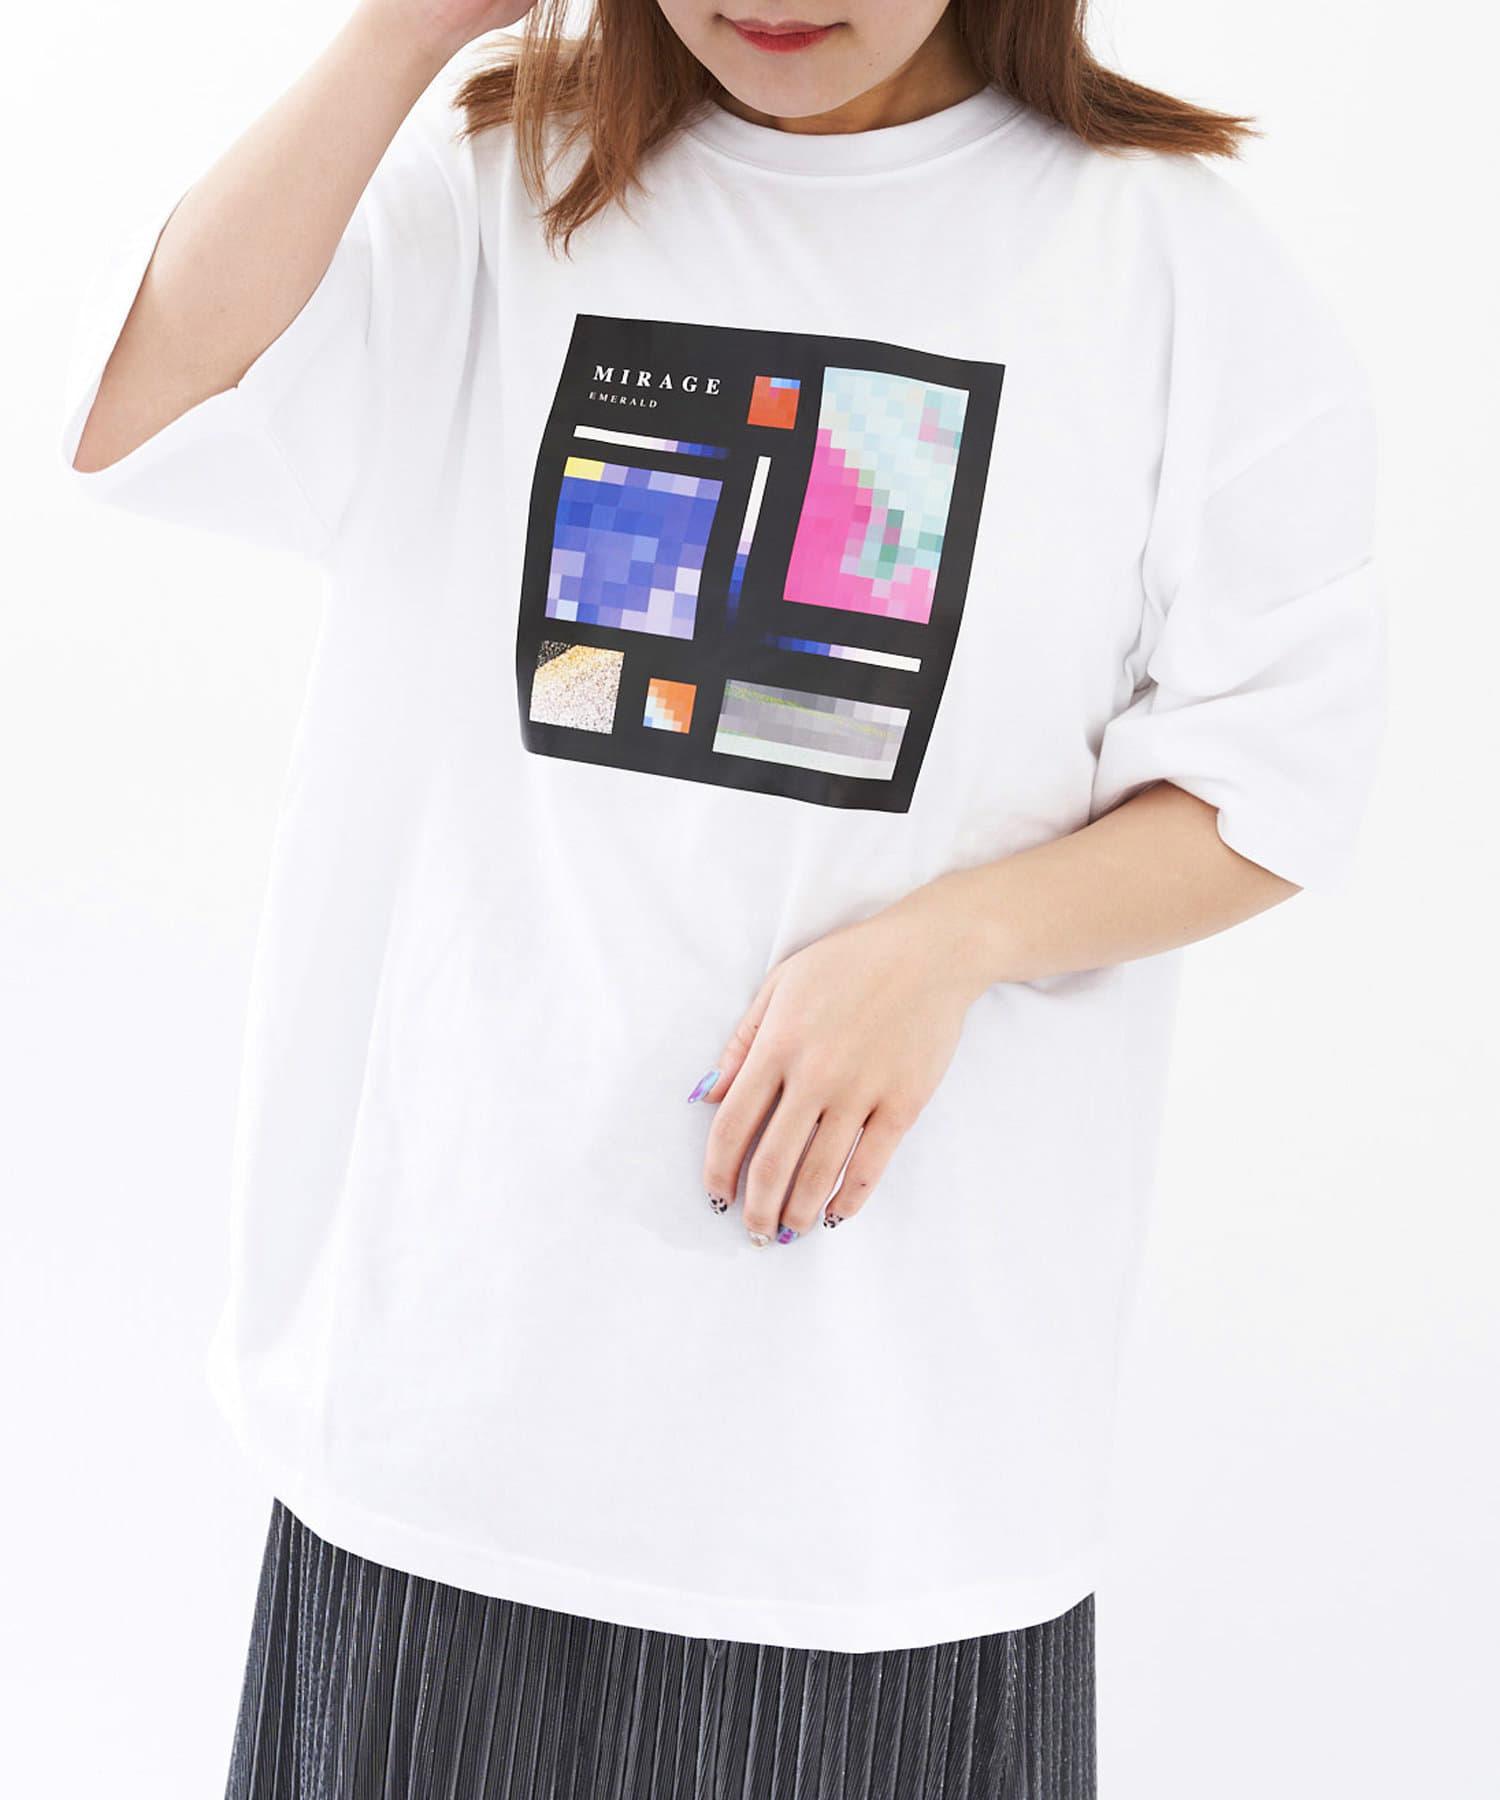 3COINS(スリーコインズ) ライフスタイル 【JUKEBOX PROJECT】AWATシャツ その他5